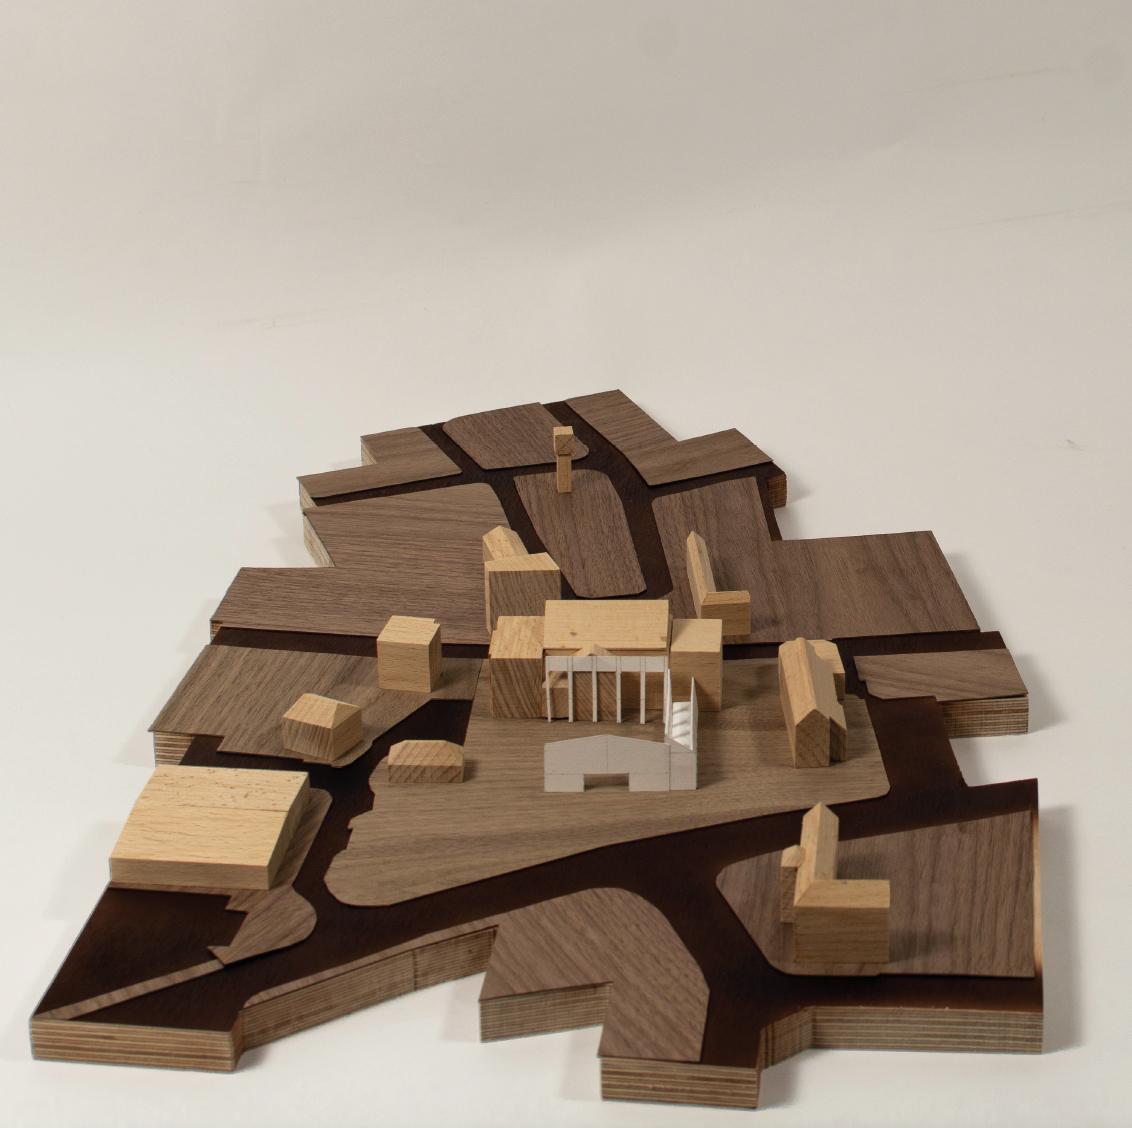 Timber Model Showing Existing Relationships.jpg